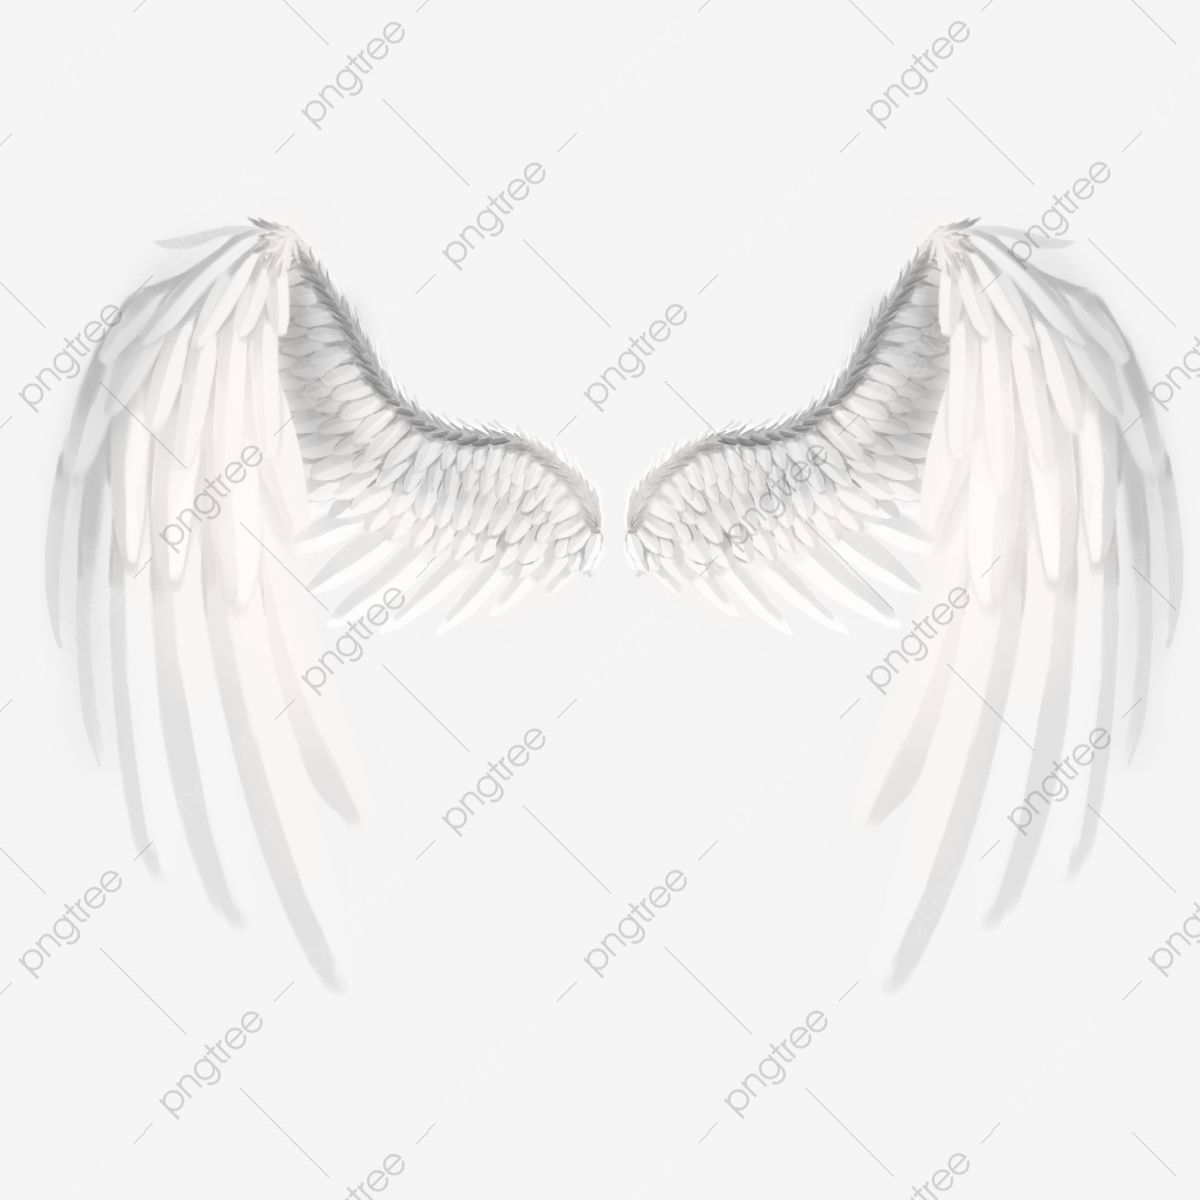 Anjo Lindas Asas Brancas Asas De Anjo Asas Brancas Asas Imagem Png E Psd Para Download Gratuito White Wings White Angel Wings Cartoon Wings